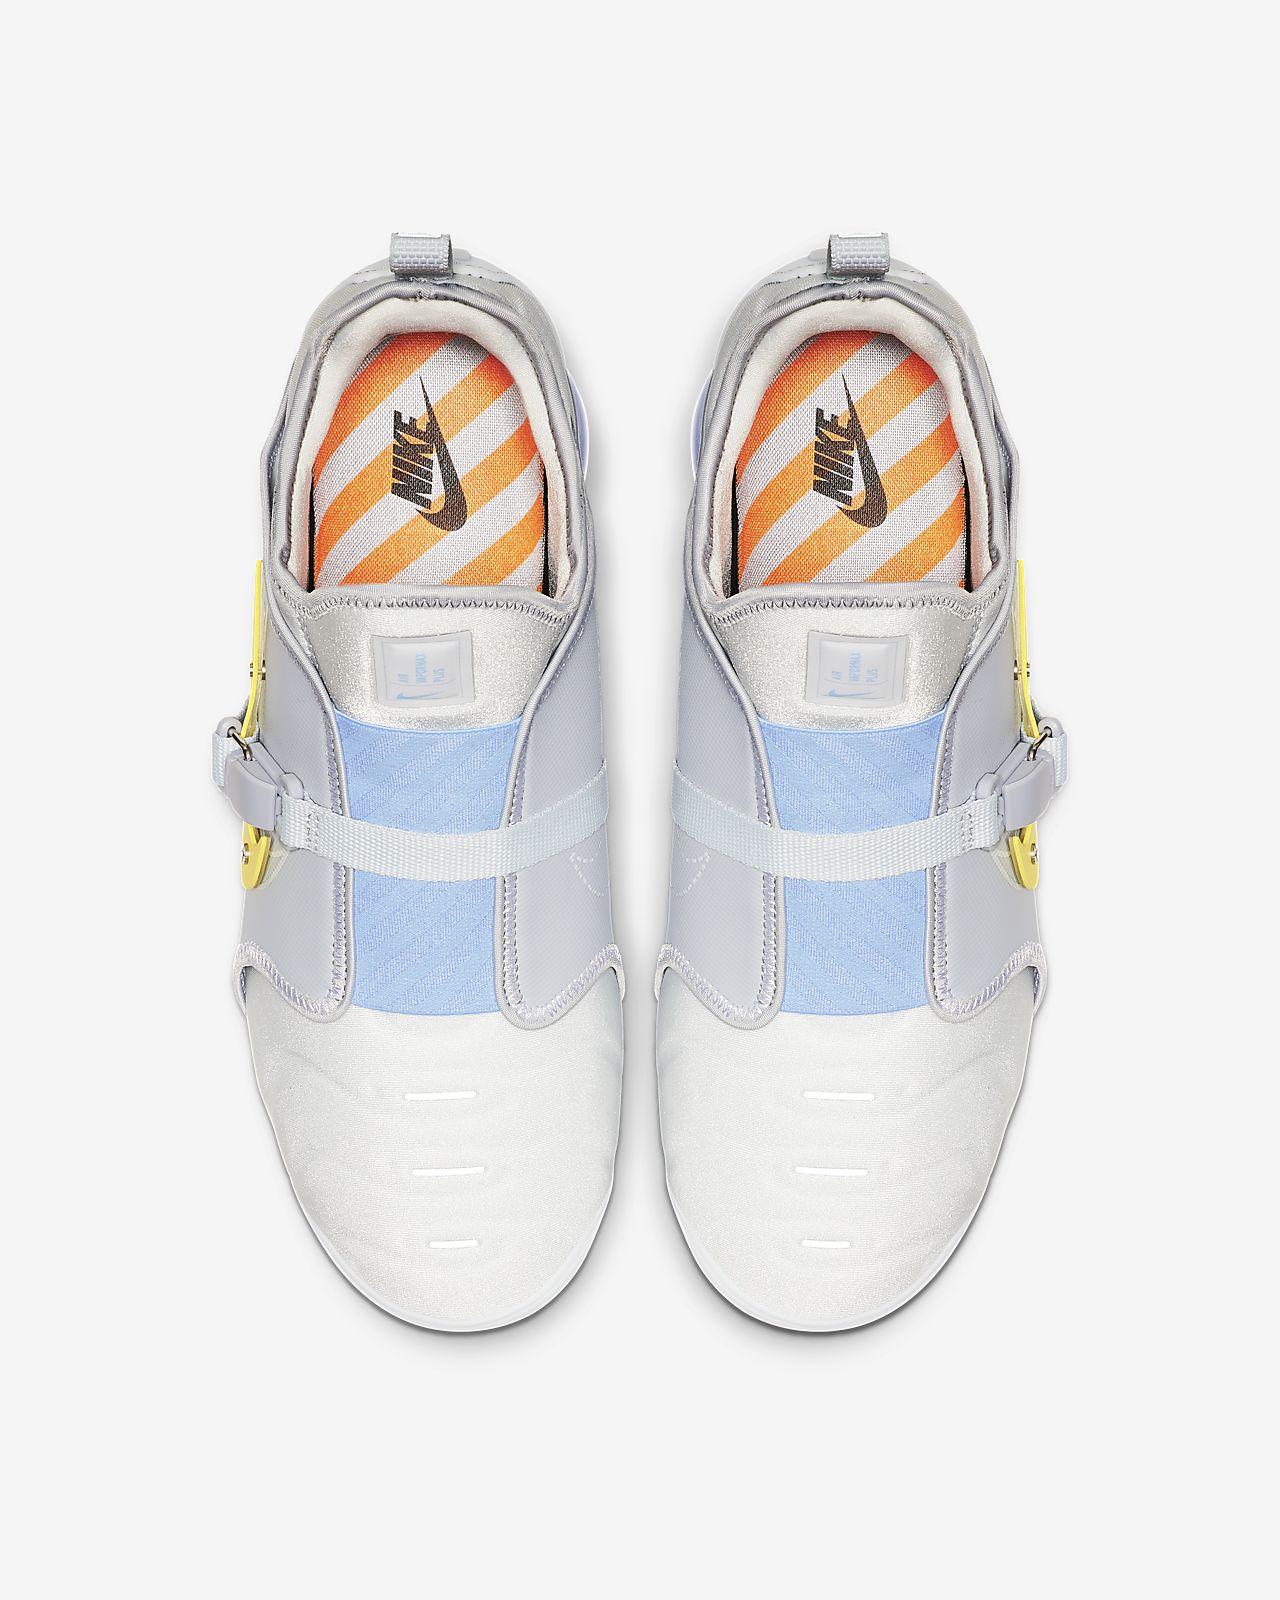 Nike Air Vapormax Plus W Scarpa beige arancione